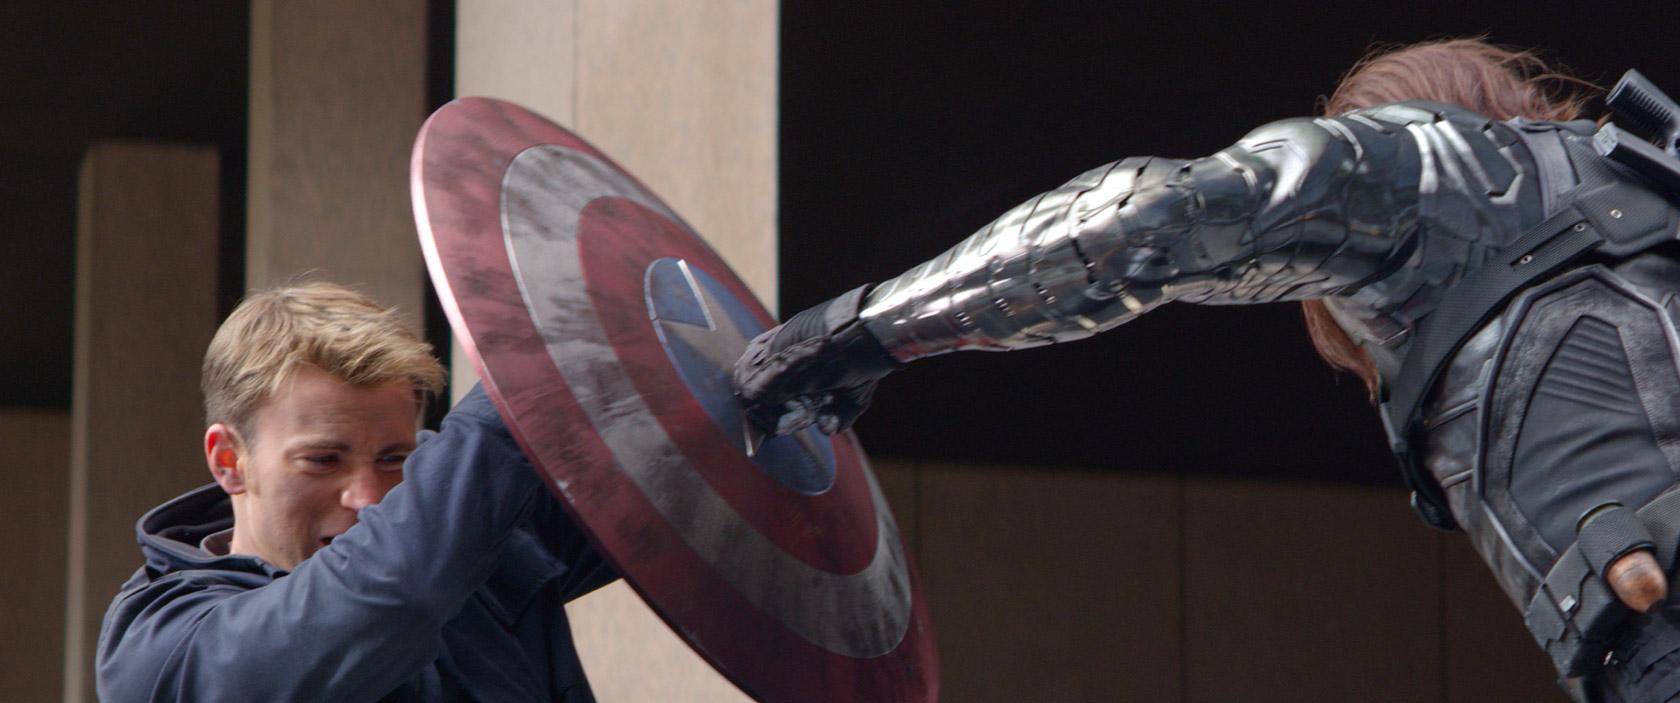 the winter soldier captain america marvel cinematic universe